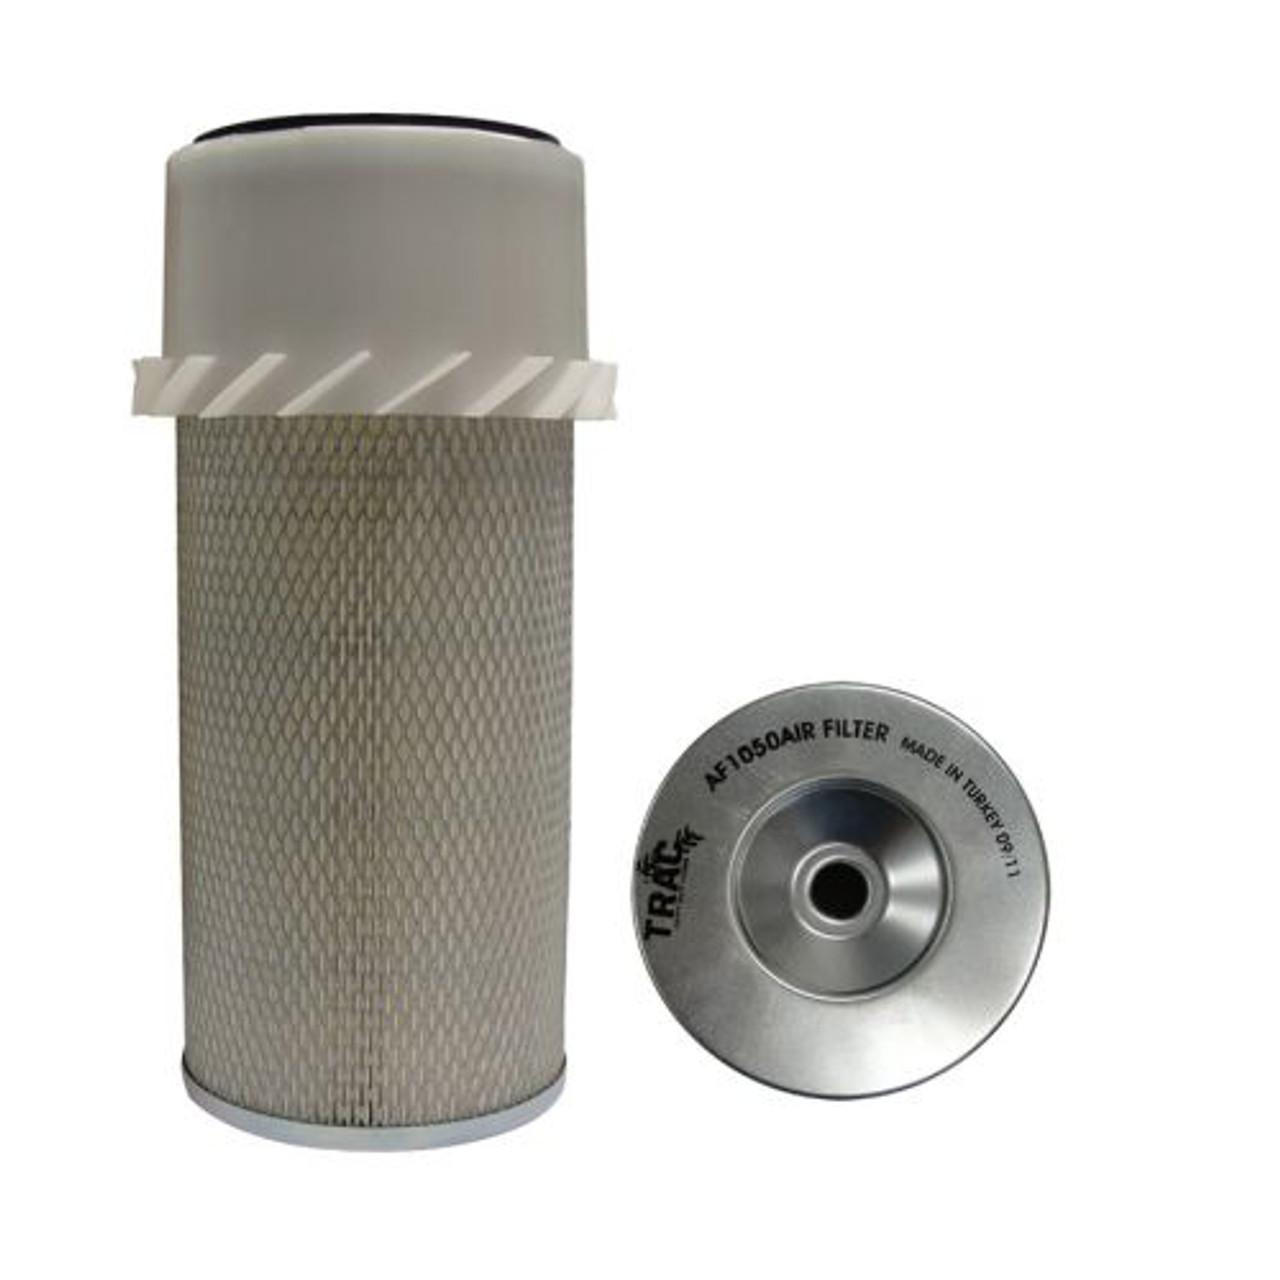 New Fuel Filter for Ford//New Holland JCB John Deere Kioti Komatsu